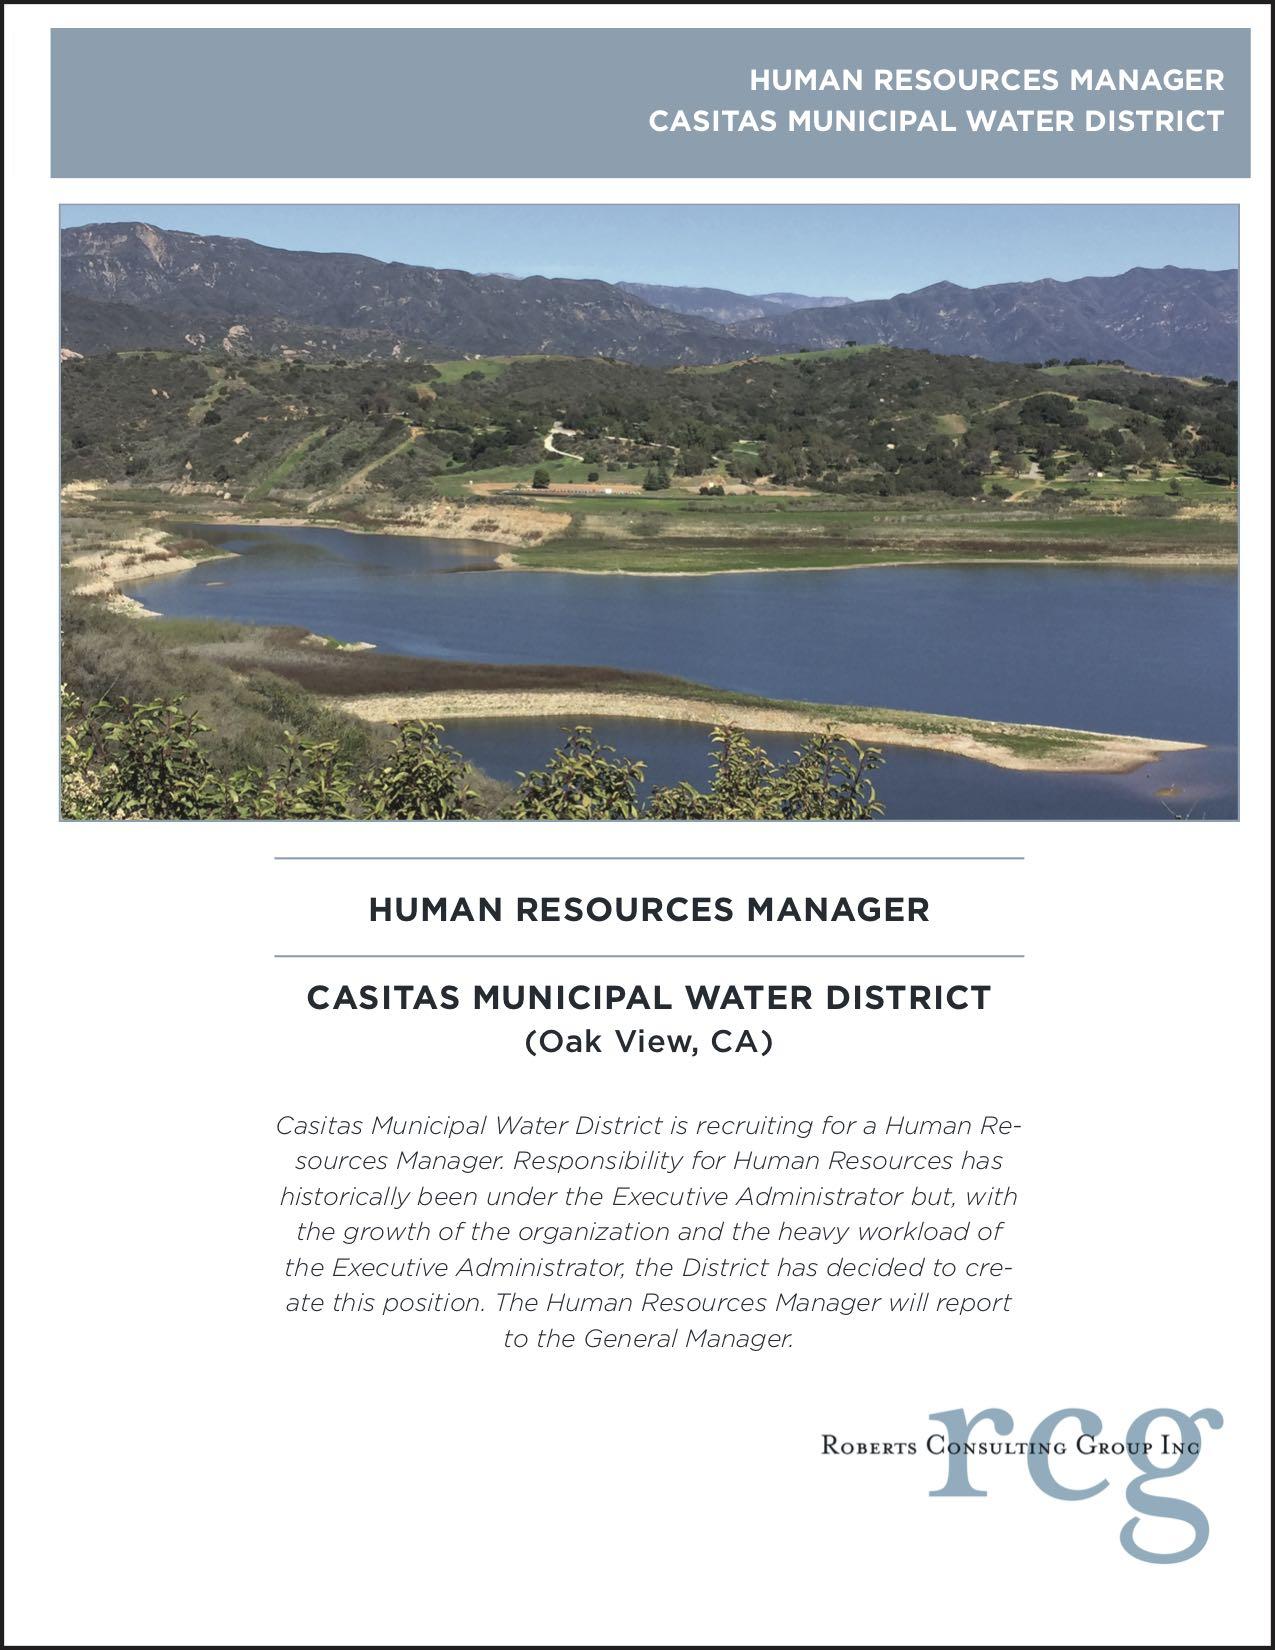 rcg_CasitasWD_HR_brochure_cover_frame.jpg